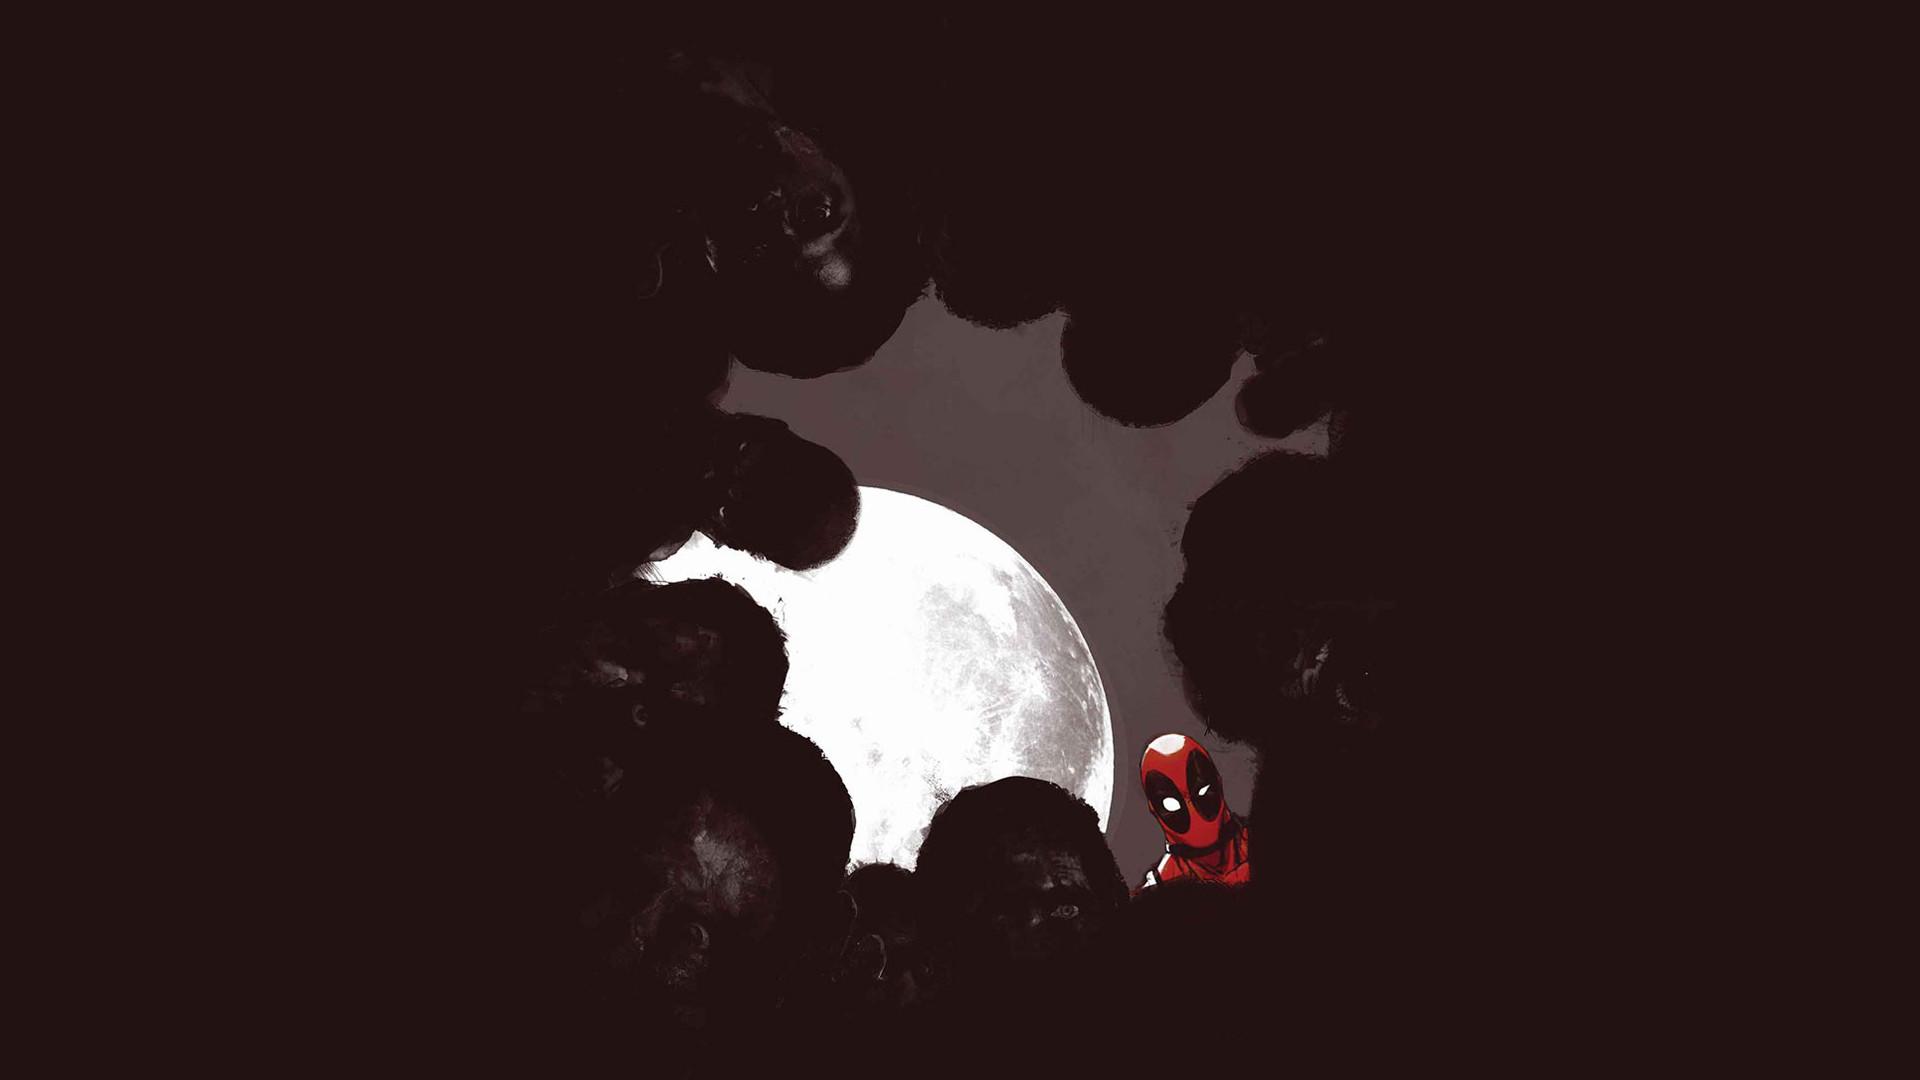 Deadpool Marvel Moon Night Zombie superhero wallpaper | | 166893  | WallpaperUP